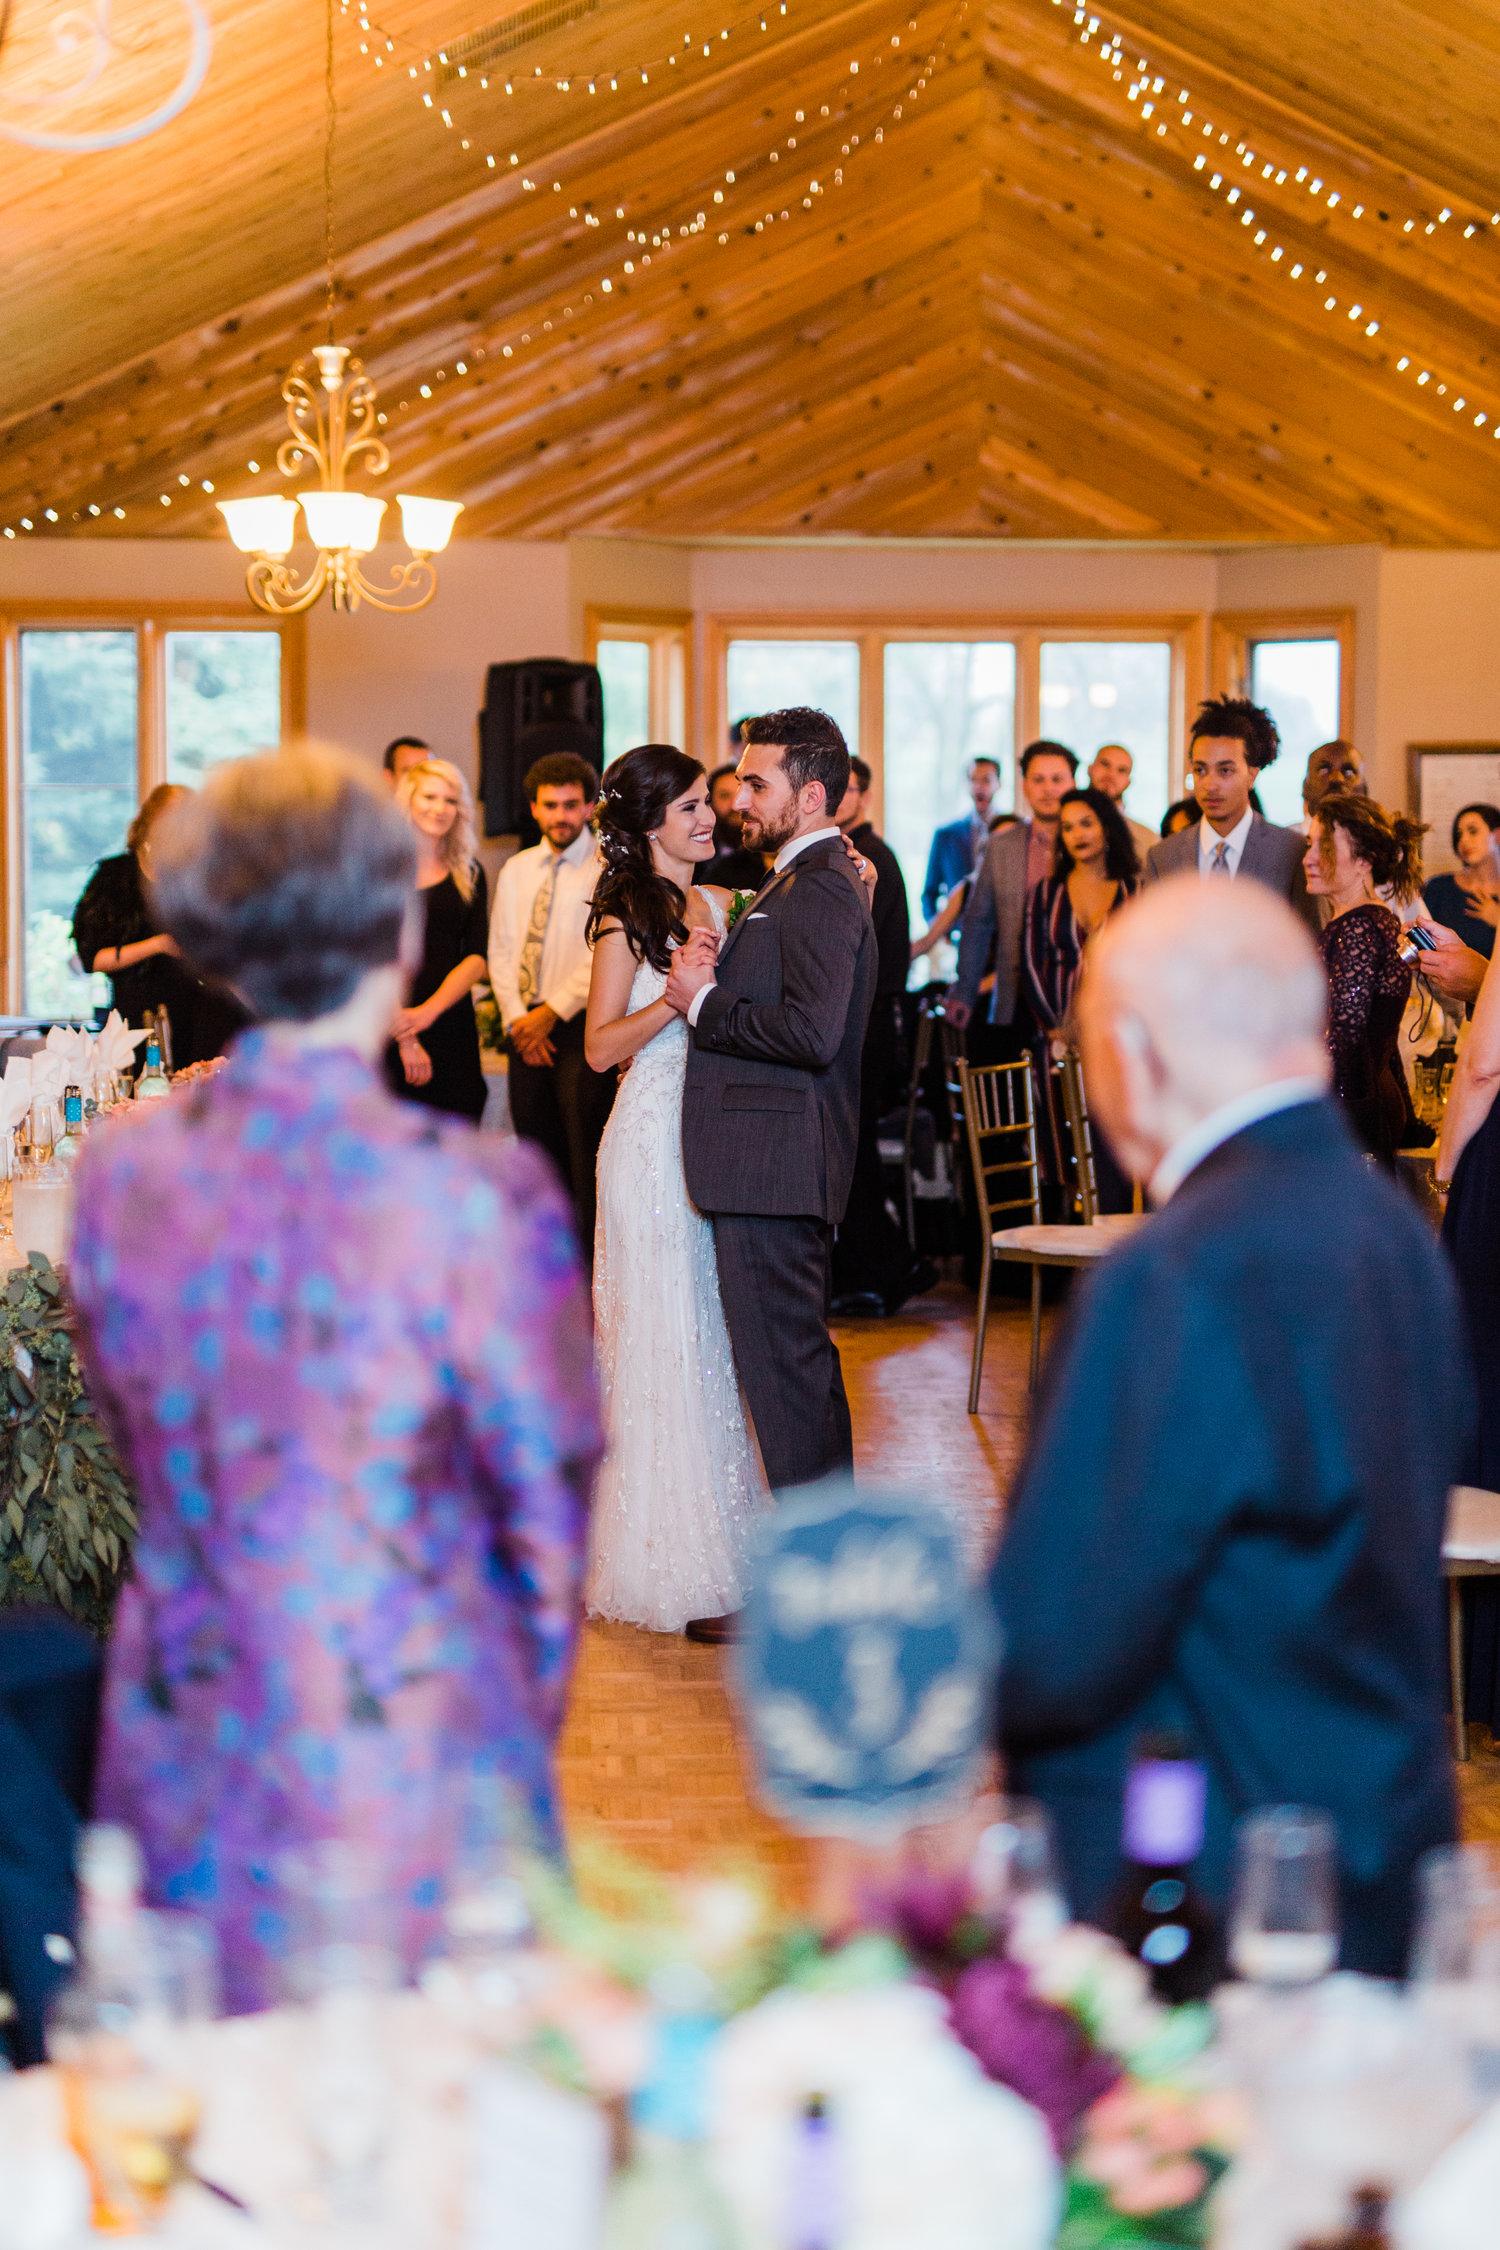 Amir-Golbazi-Danielle-Giroux-Photography_Toronto-Wedding_Cedarwood_Rachel-Paul_607.jpg